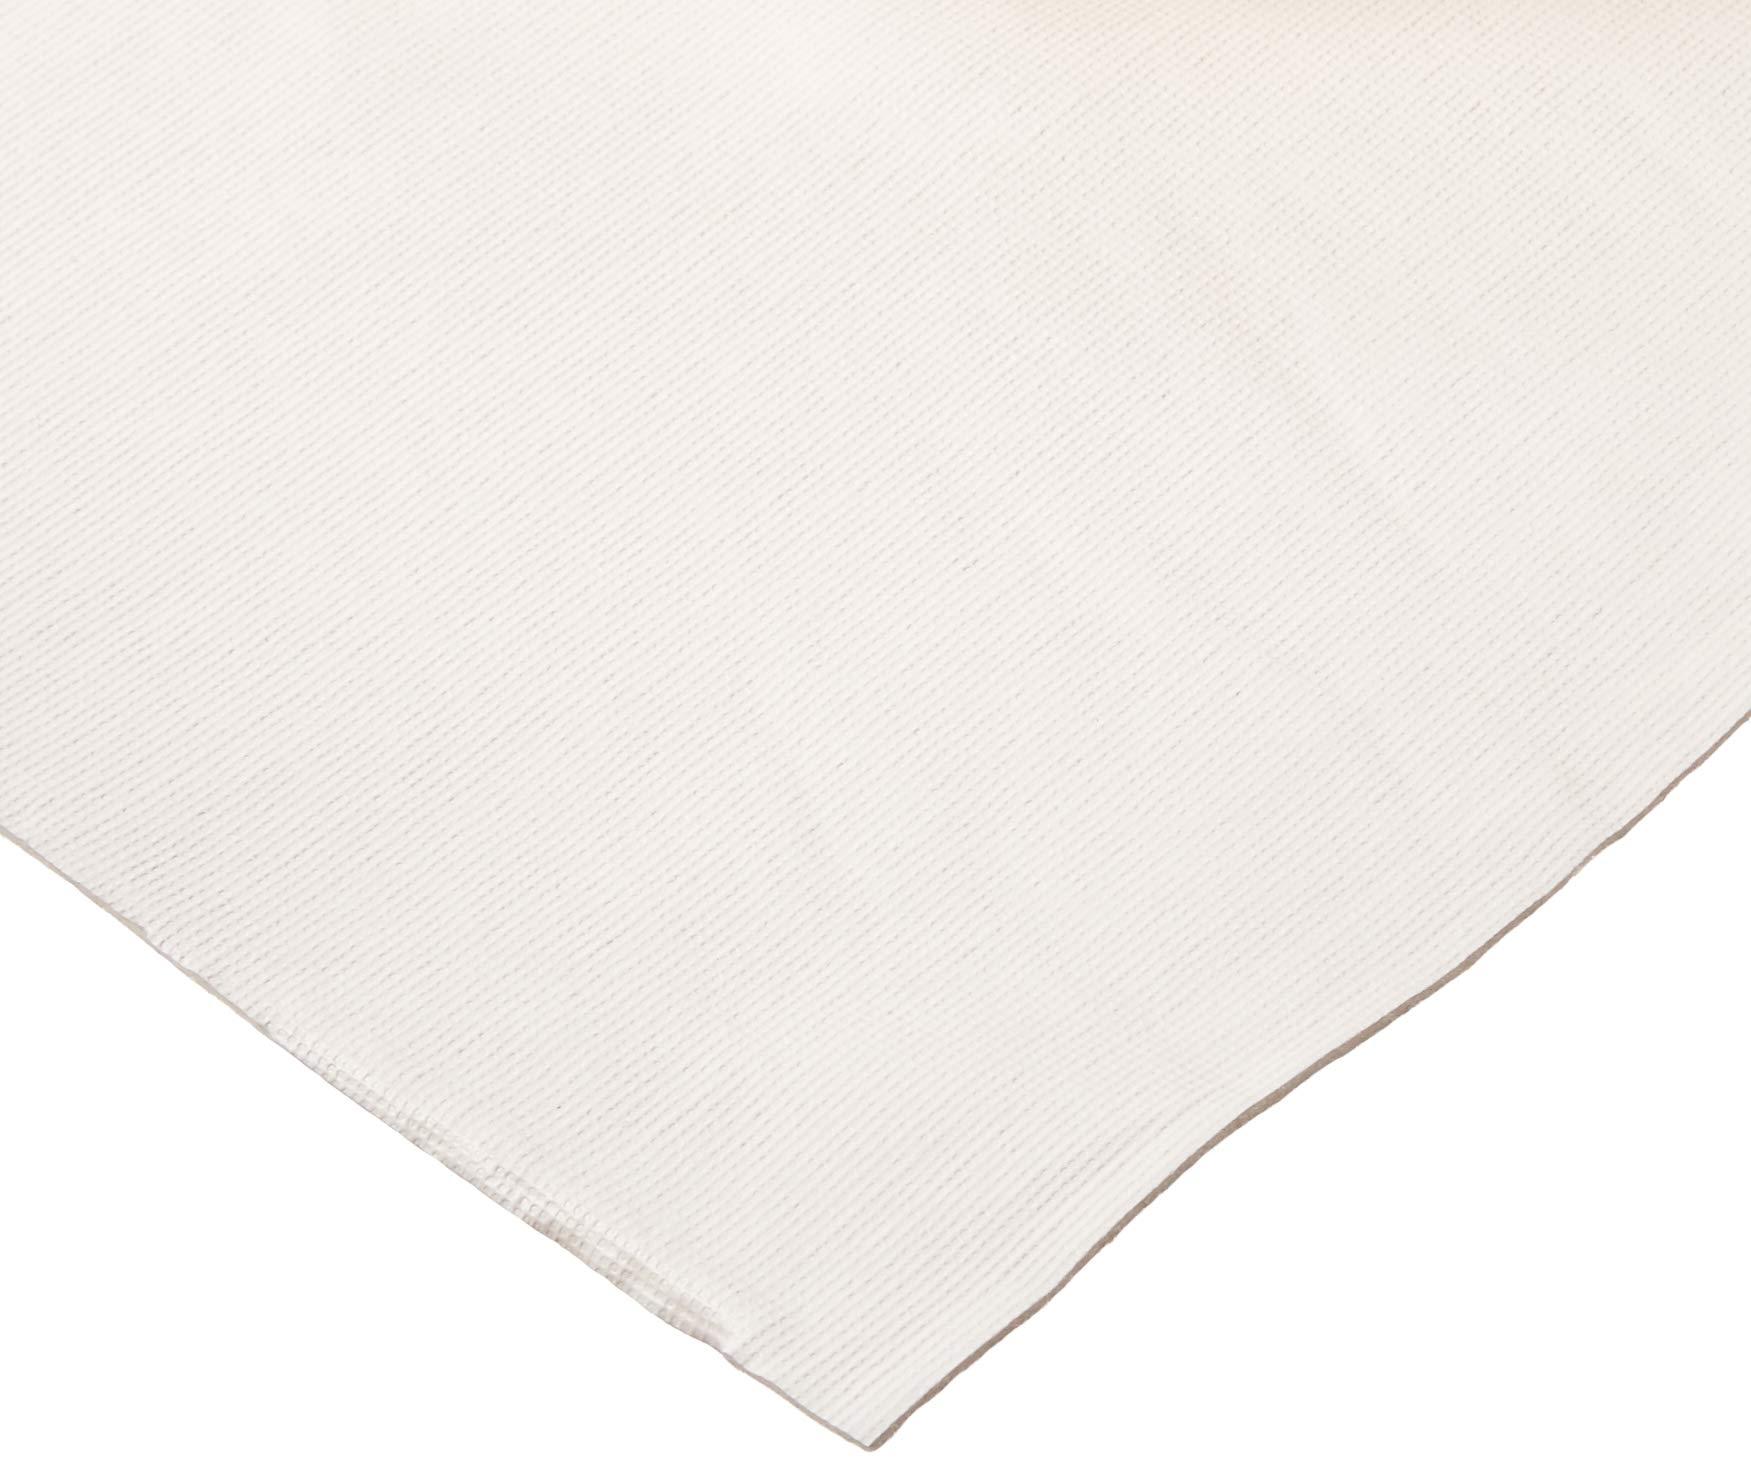 HomeCrate TPAD Wide Premium Cushioned Heavy Duty Vinyl Table Pad, 70'' X 120'', Cream